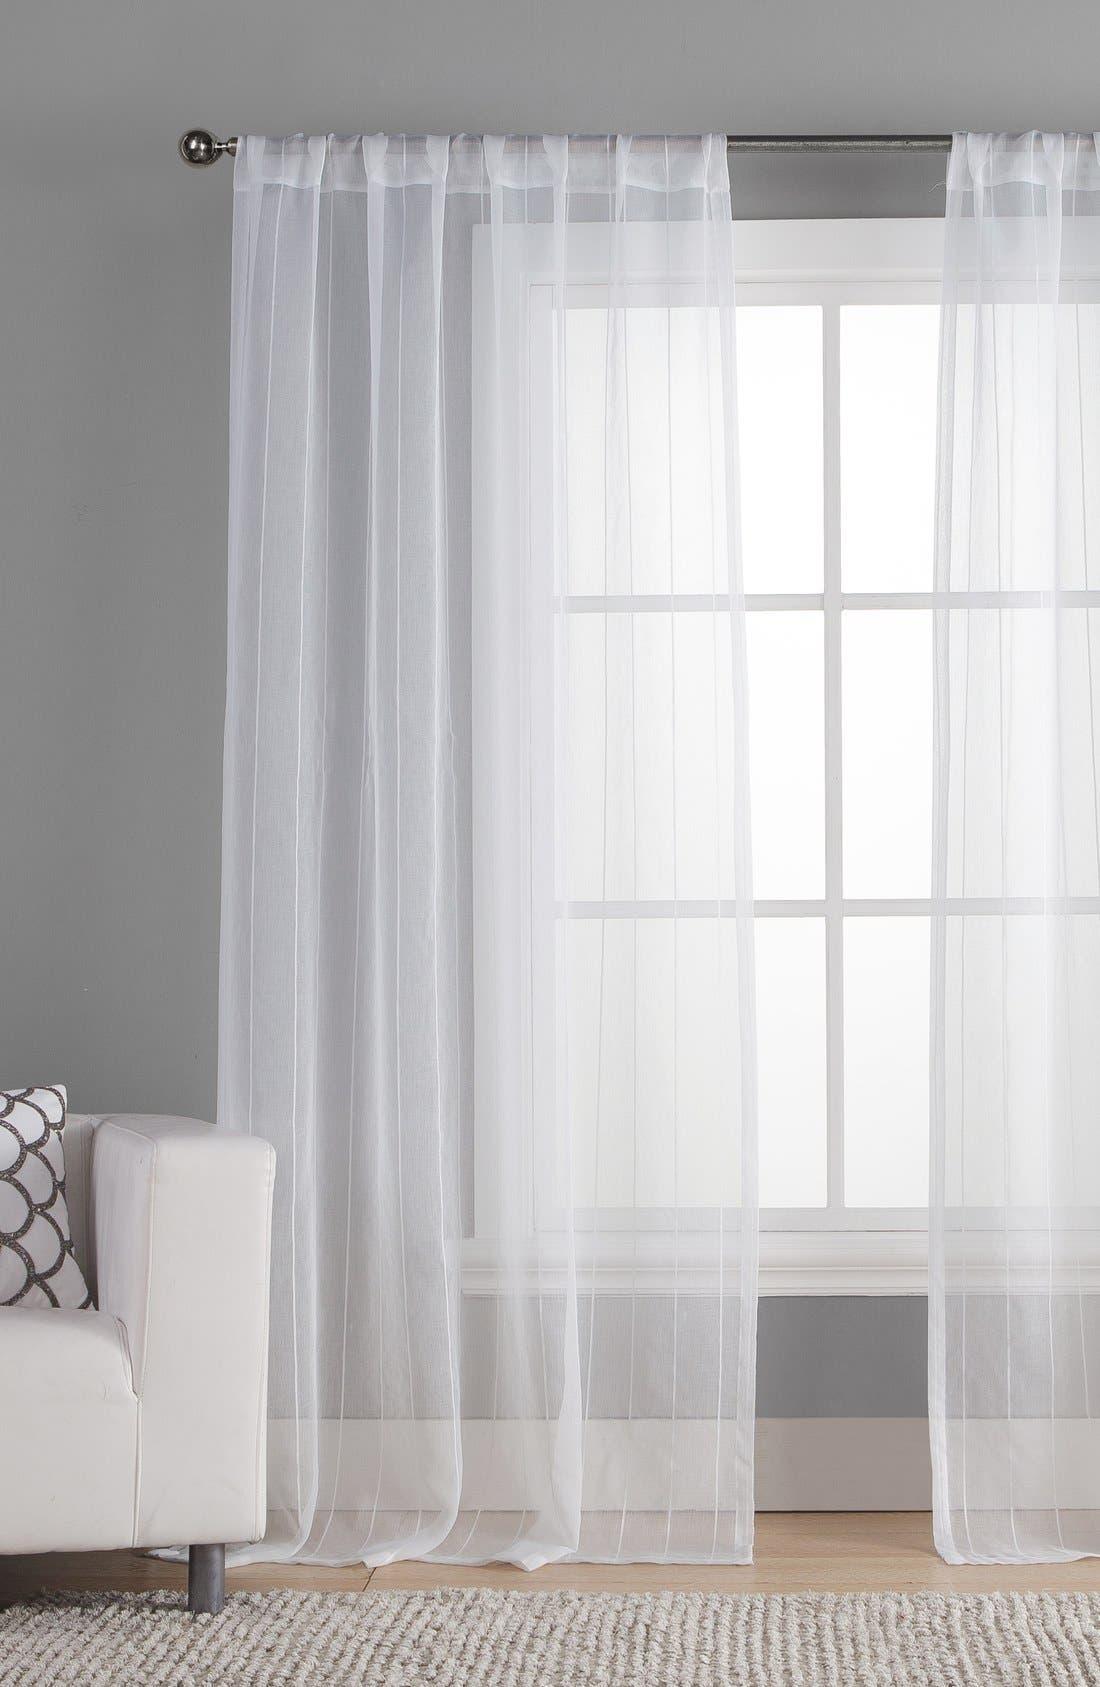 Alternate Image 1 Selected - Duck River Textile 'Henriette' Pole Top Window Panels (Set of 2)